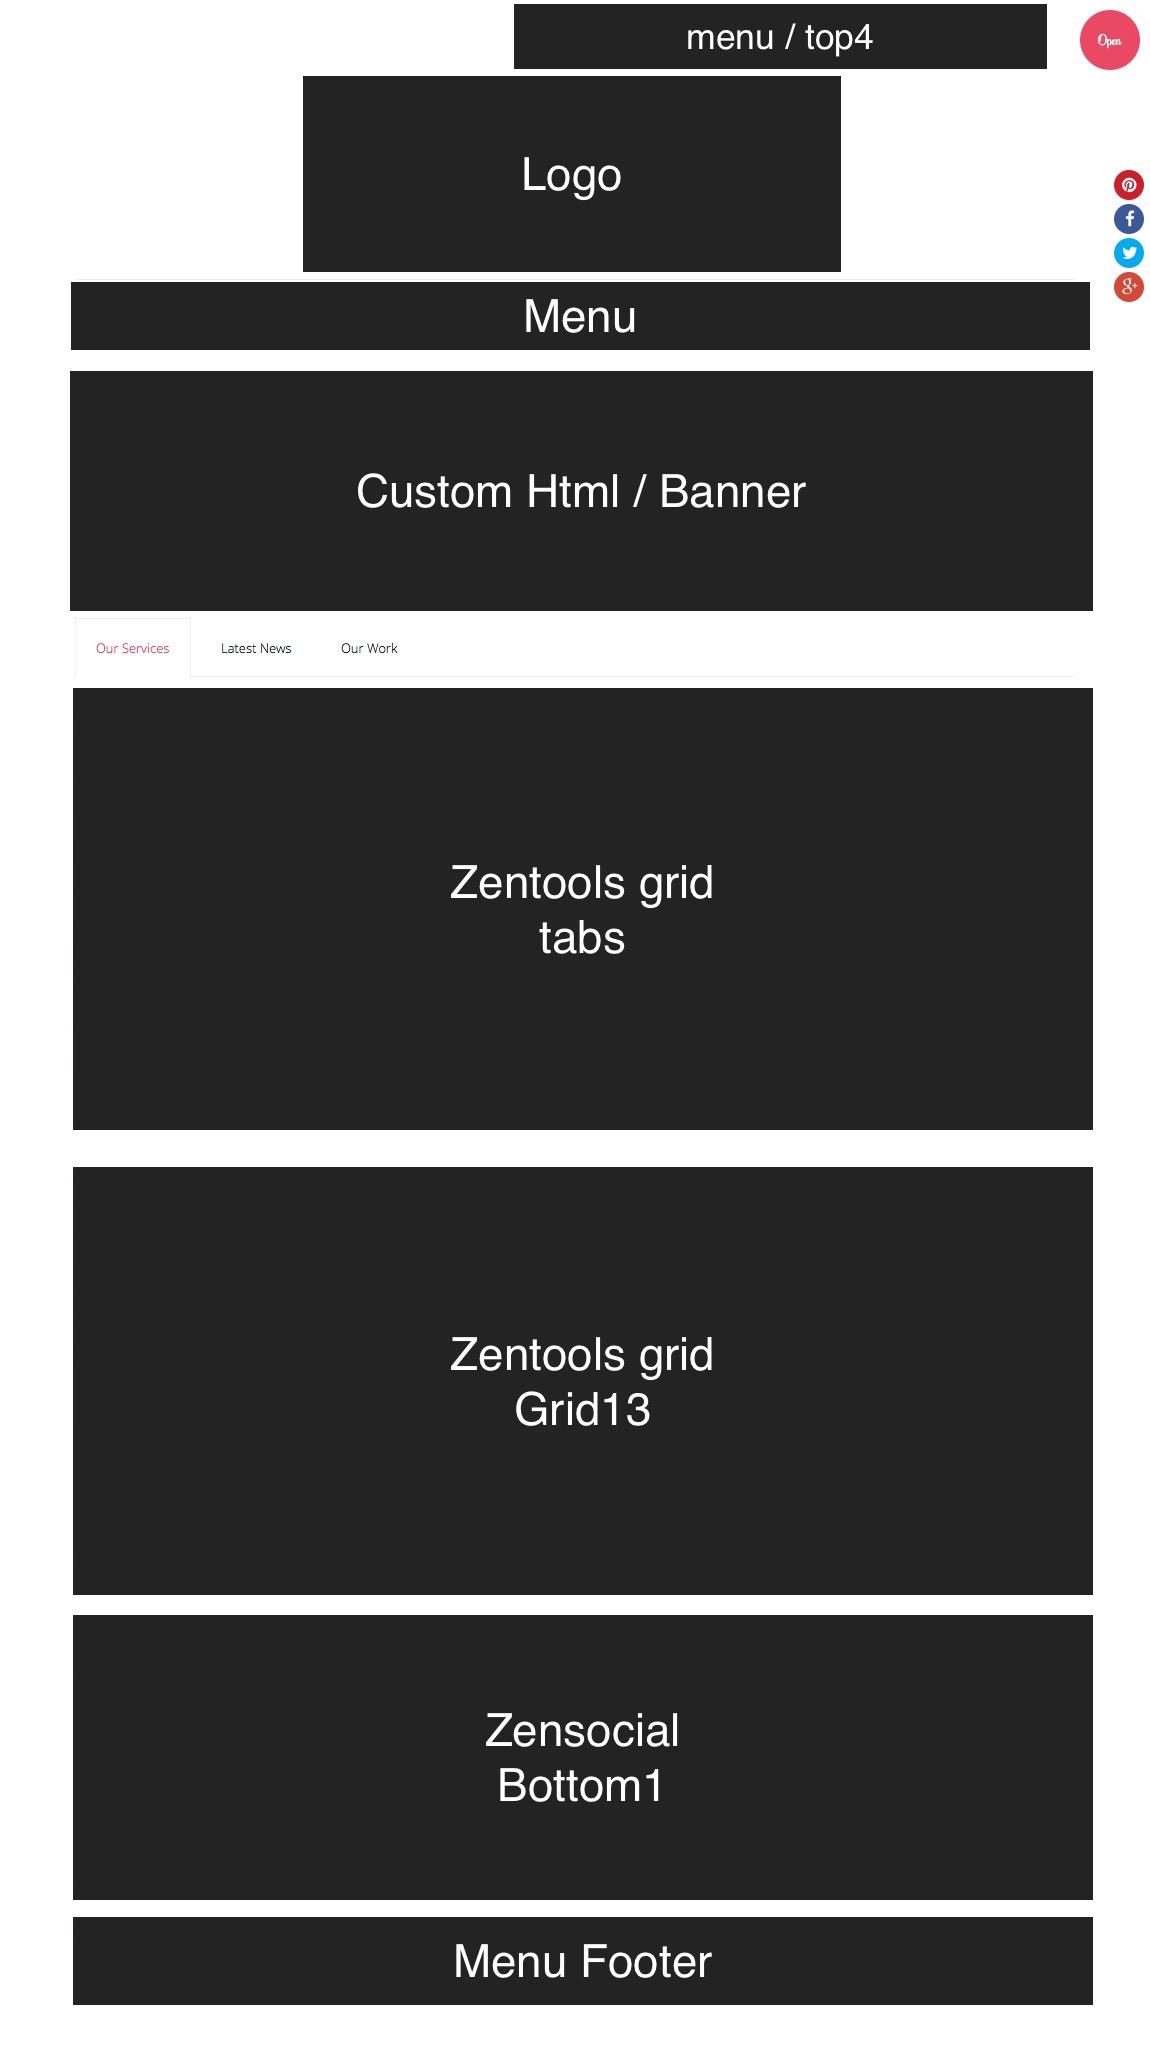 responsive2 Front page setup